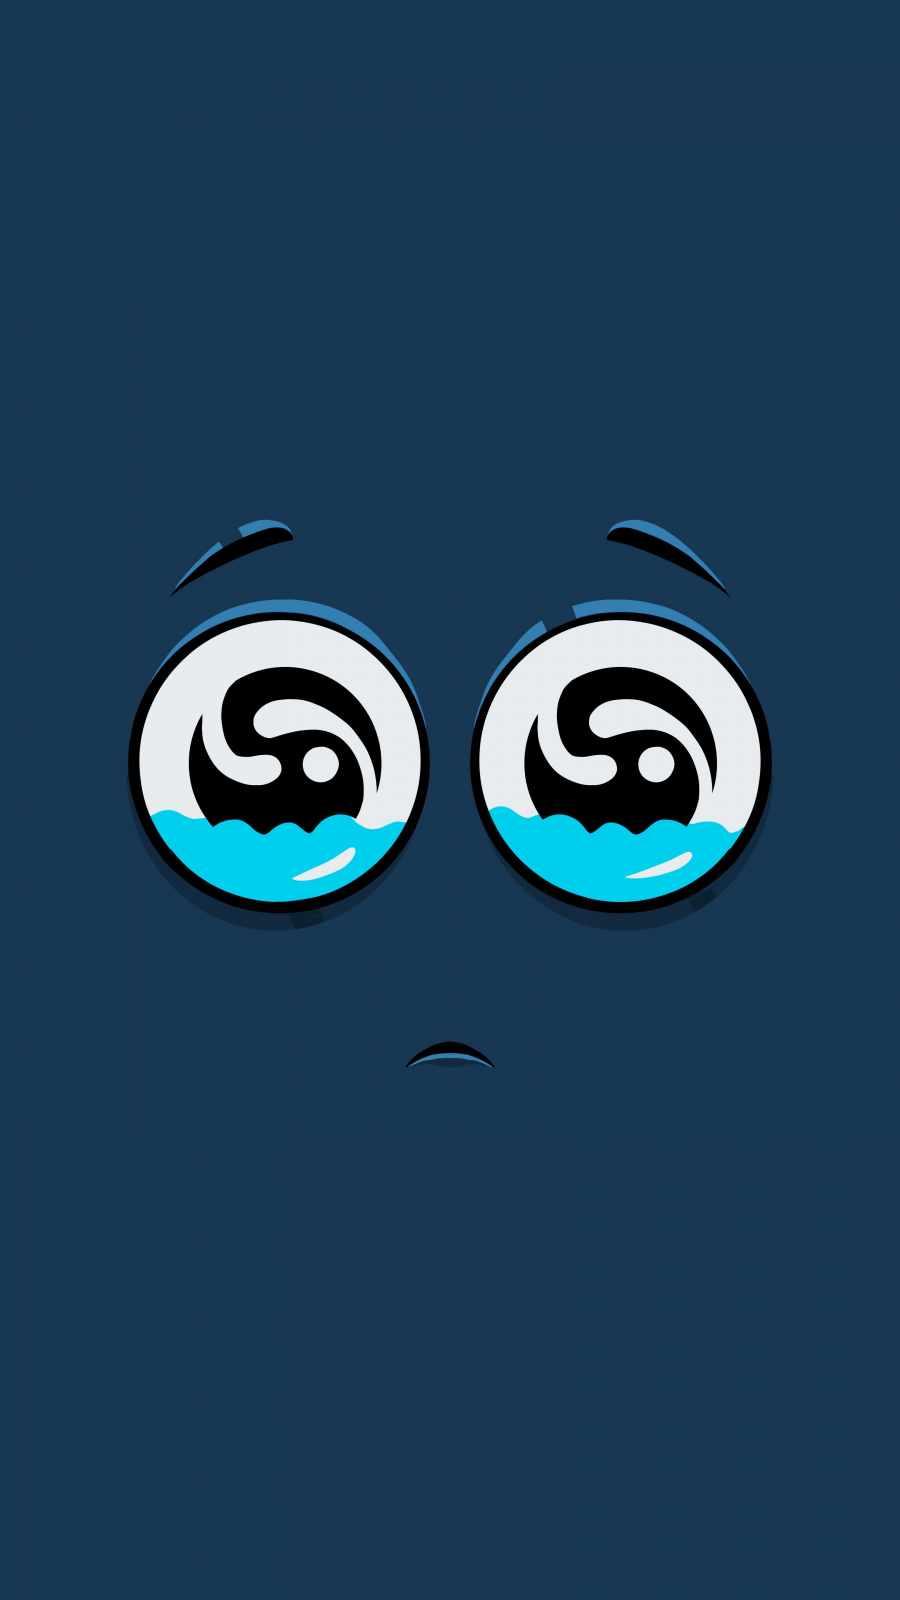 Emotional Face iPhone Wallpaper